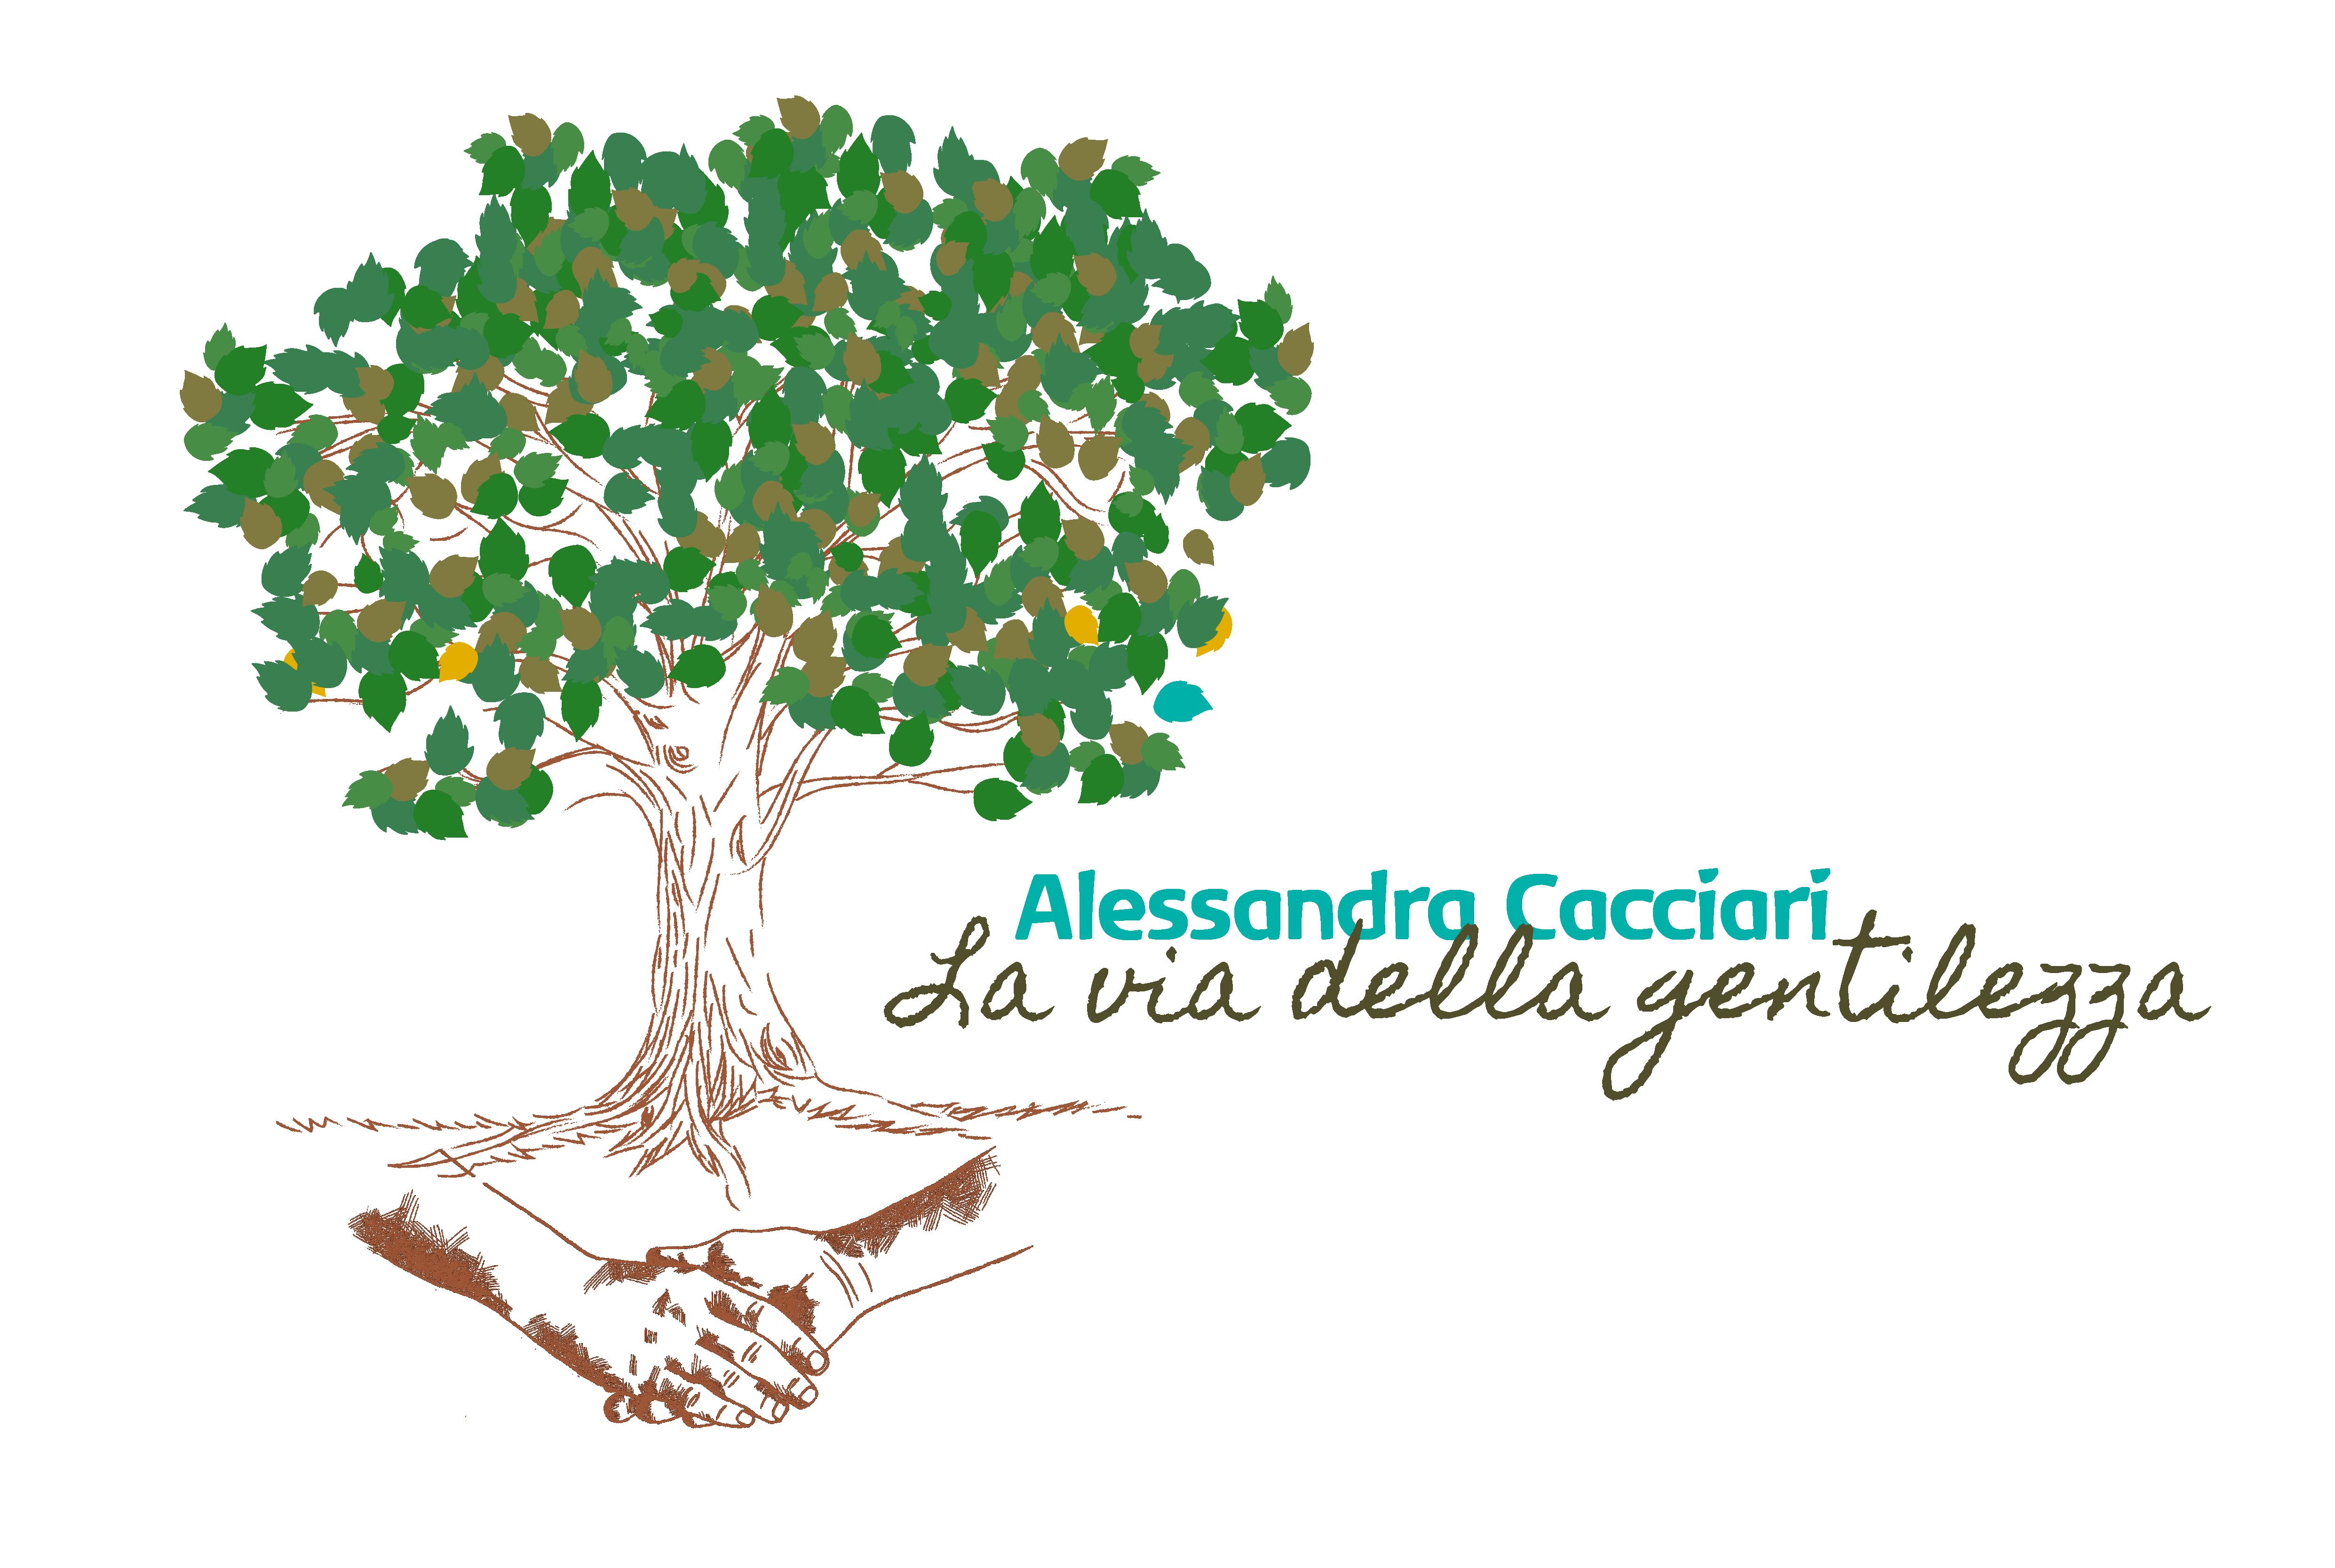 Alessandra Cacciari logo